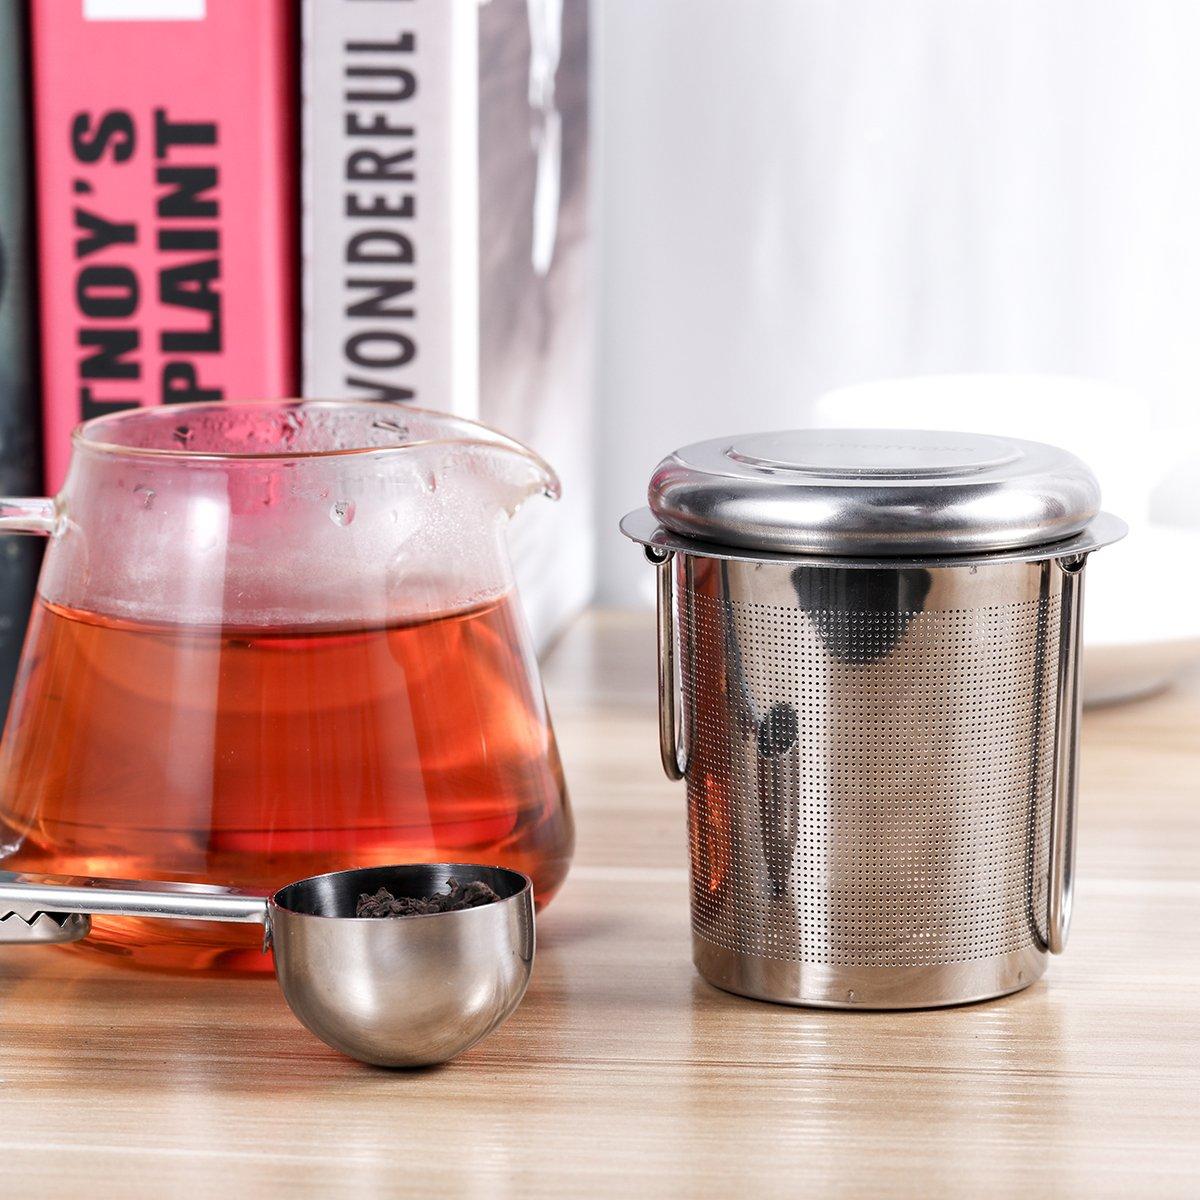 Cups 2 Pack 304 Stainless Steel Tea Strainer Tea Steeper /& 1 Scoop for Hanging on Teapots HOMEMAXS Tea Infuser for Loose Tea Mugs